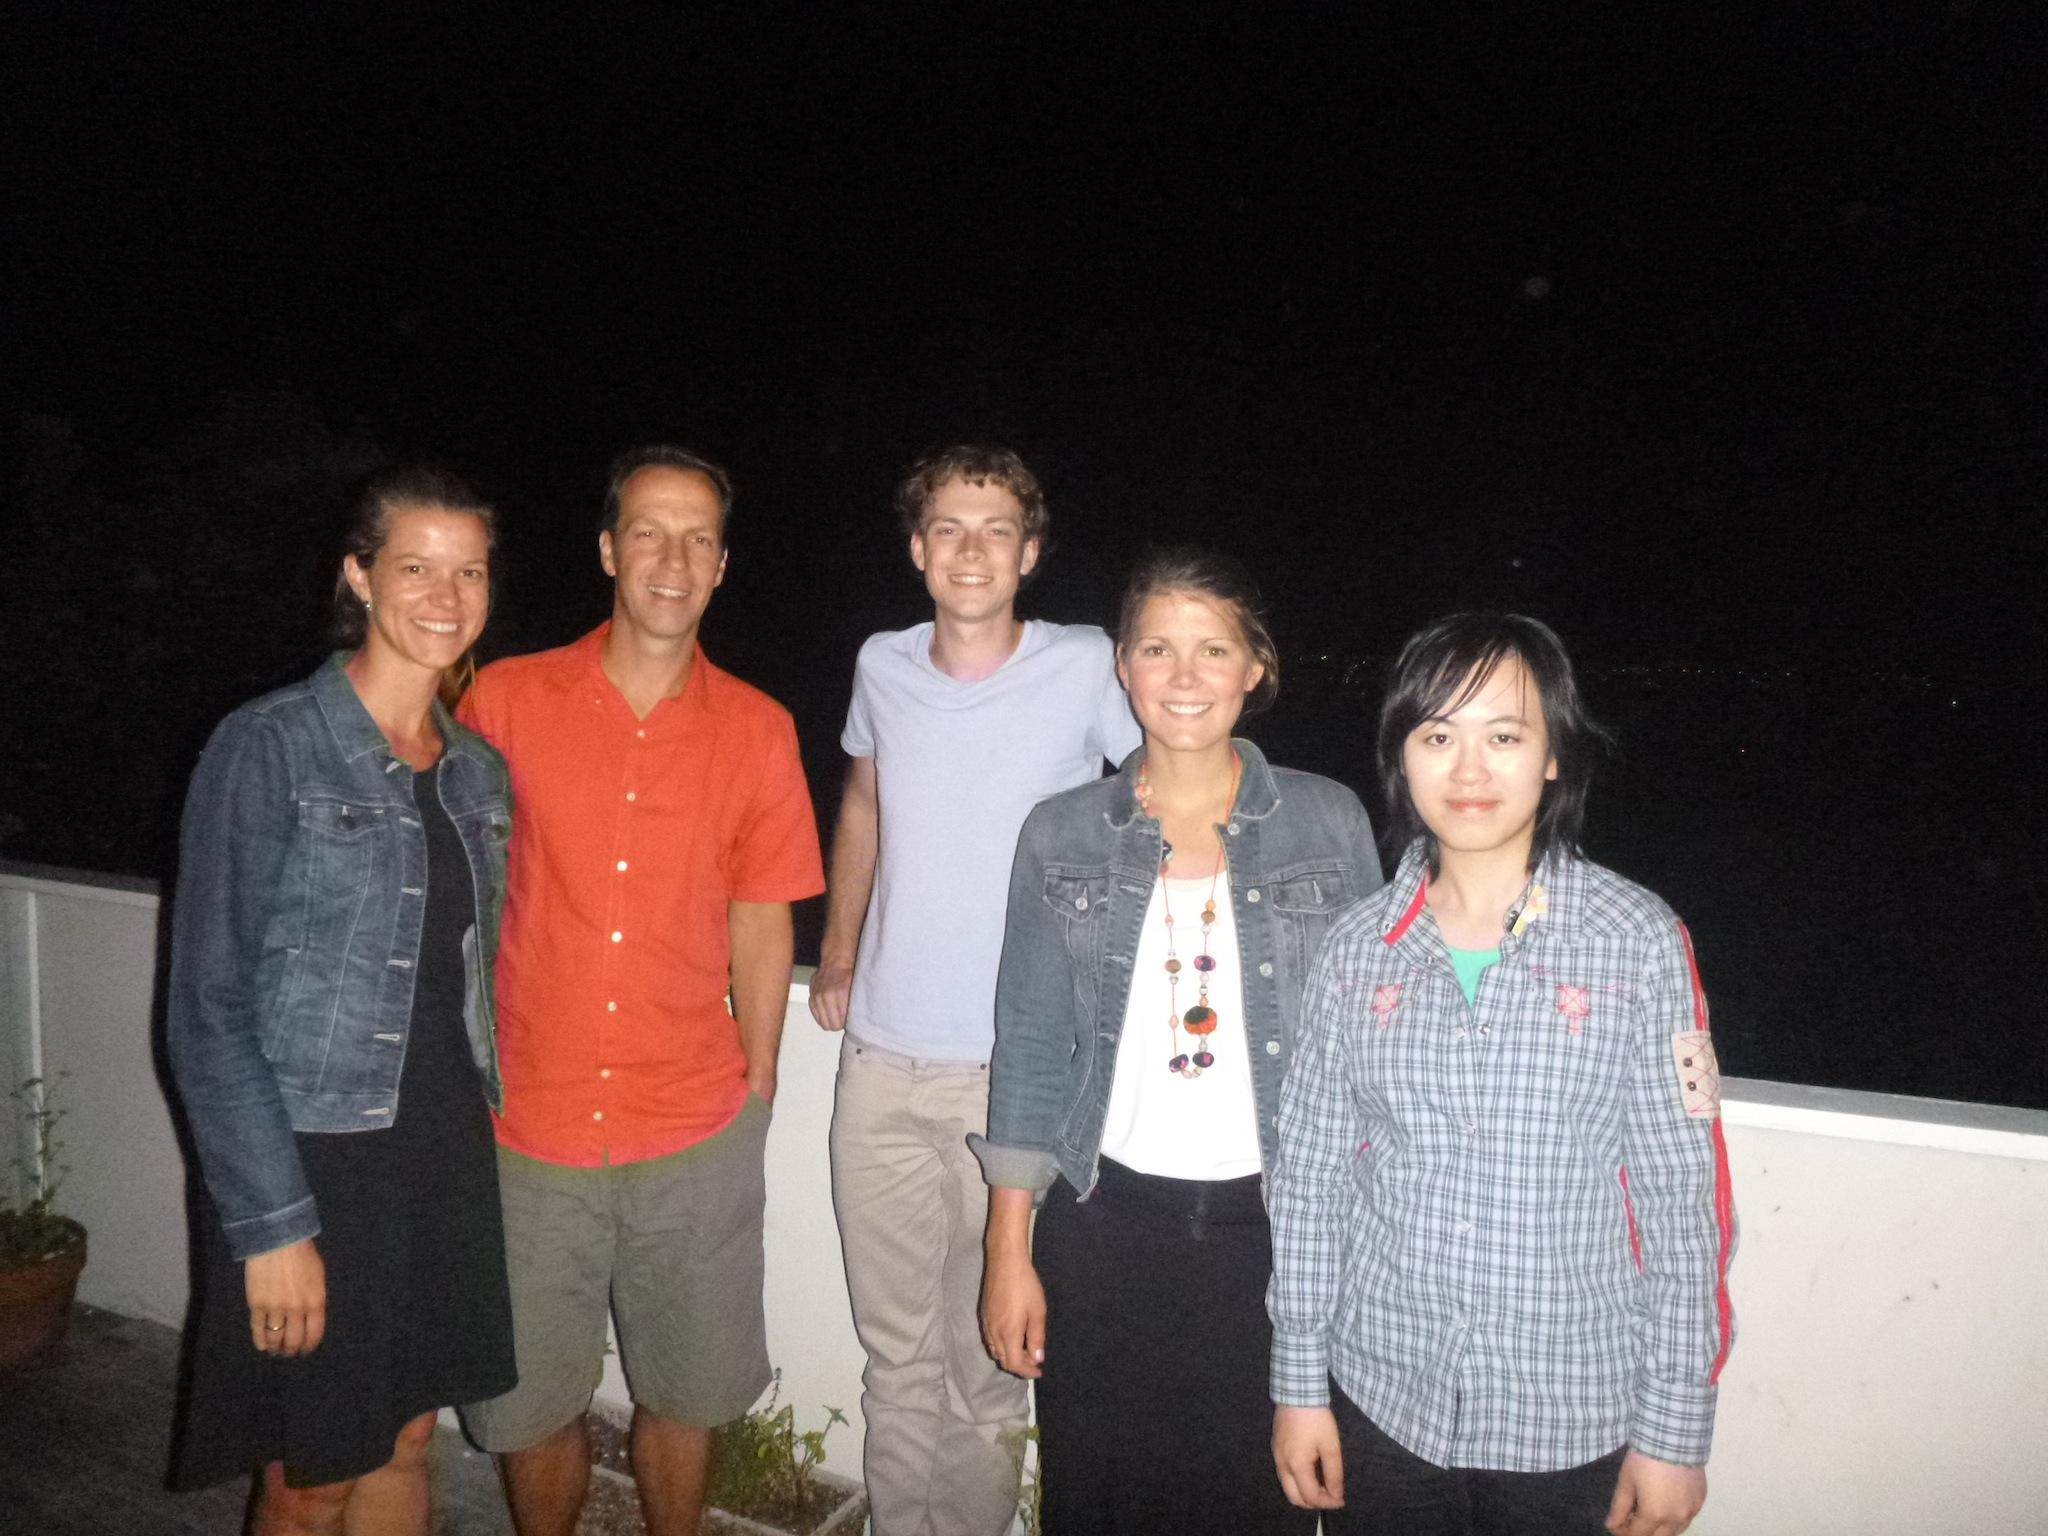 From left to right: Mila, Kasper, Sam, Jami and Rachel